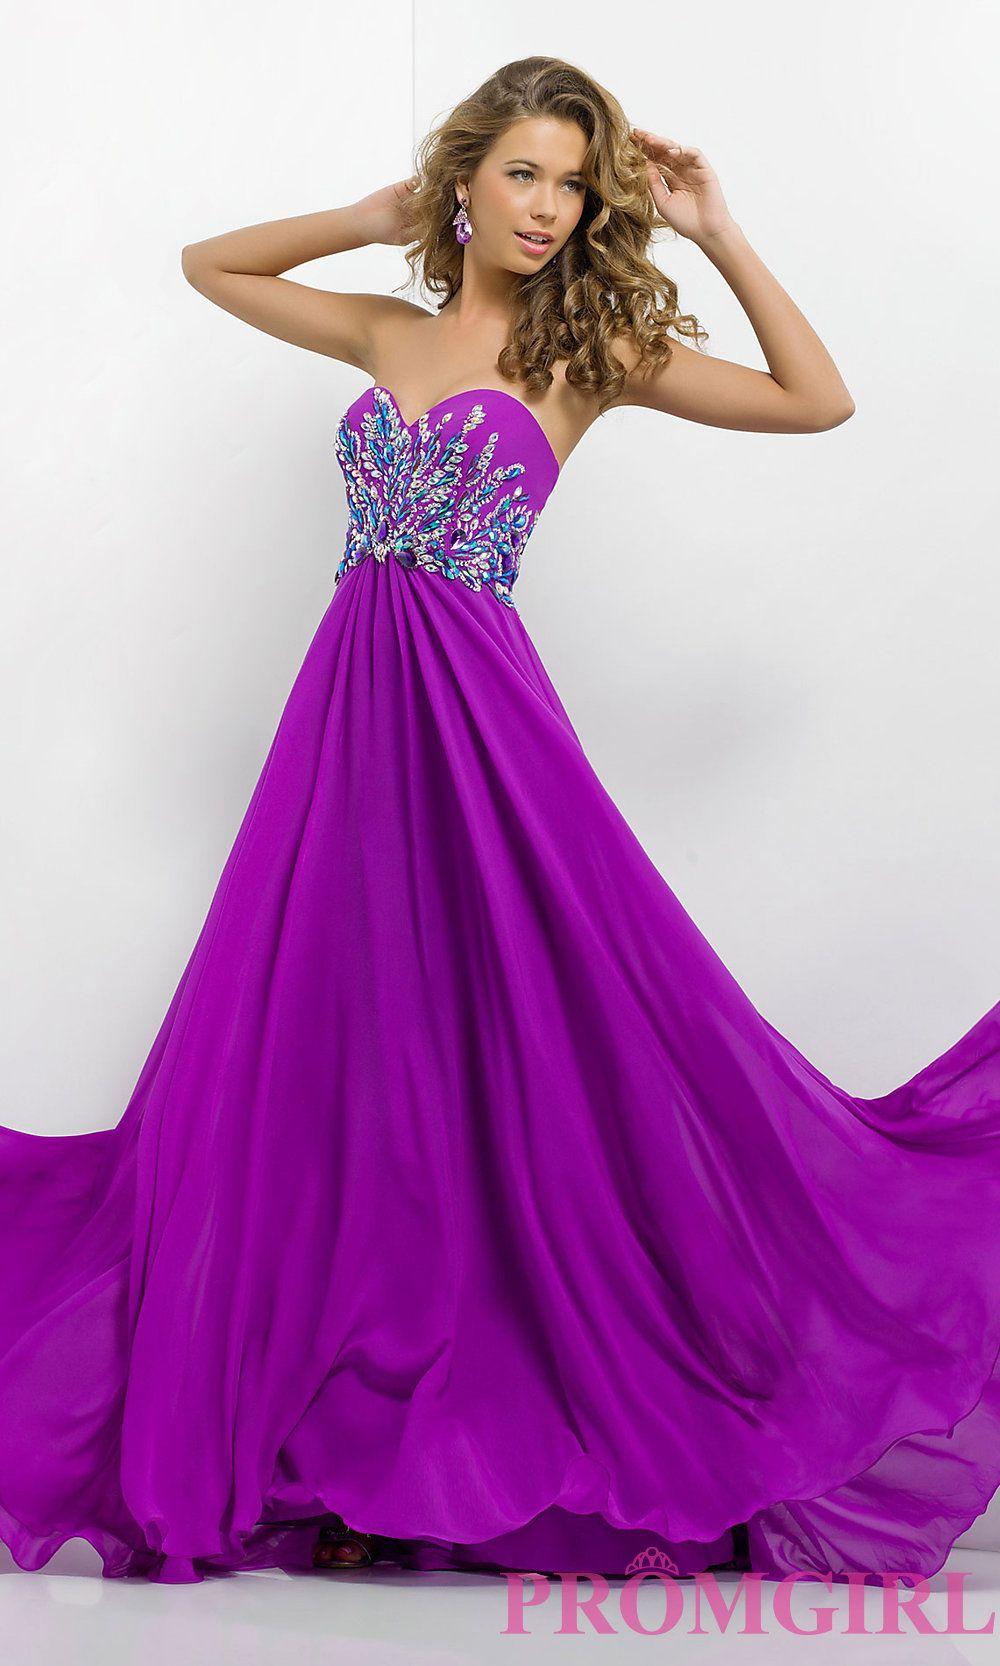 Long prom dress style bl front image dresses pinterest